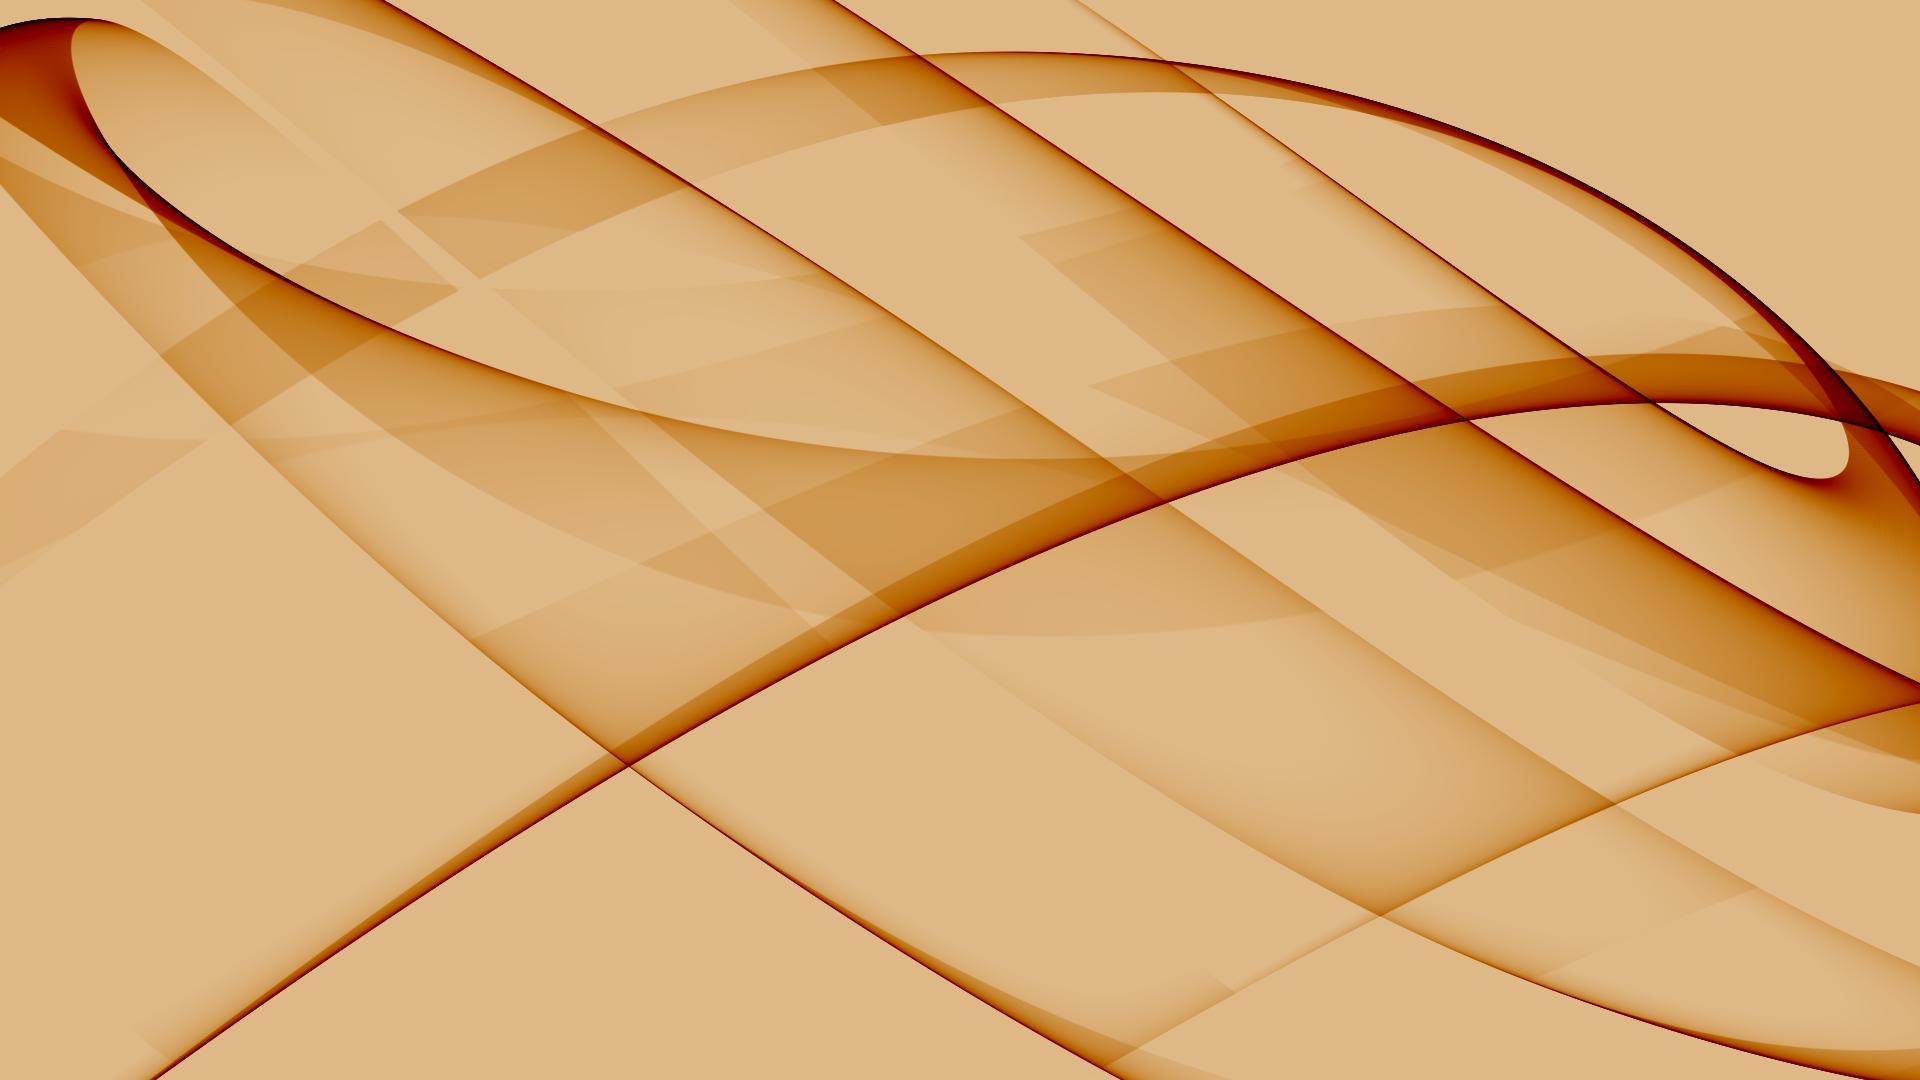 courbes-aleatoires